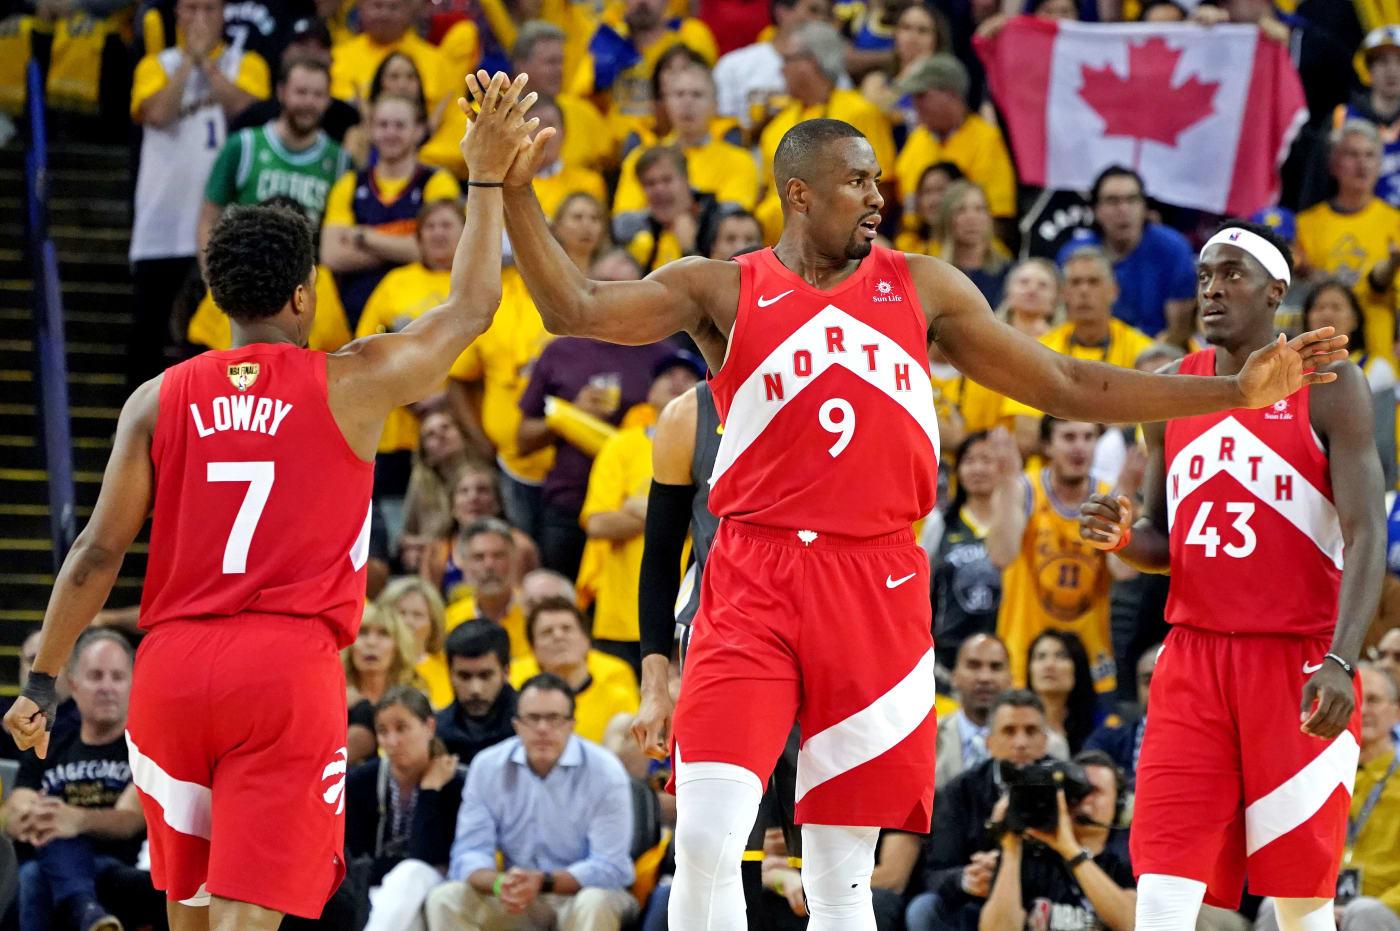 Lowry Ibaka Siakam NBA Finals Game 4 2019